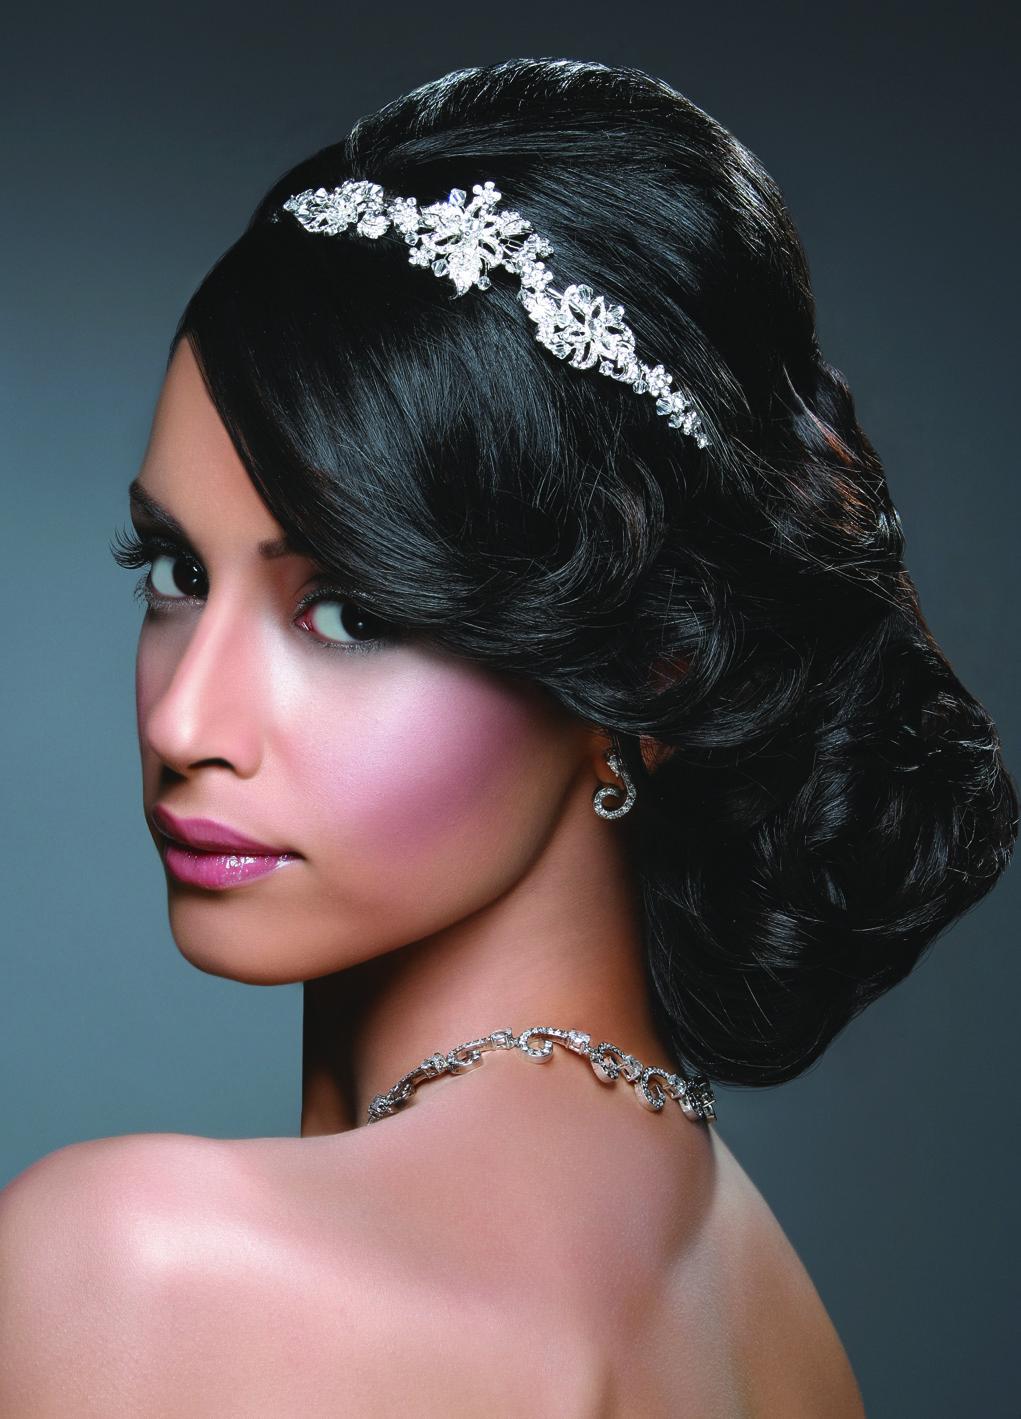 261-AW13-Bridal Profiles-2.jpg